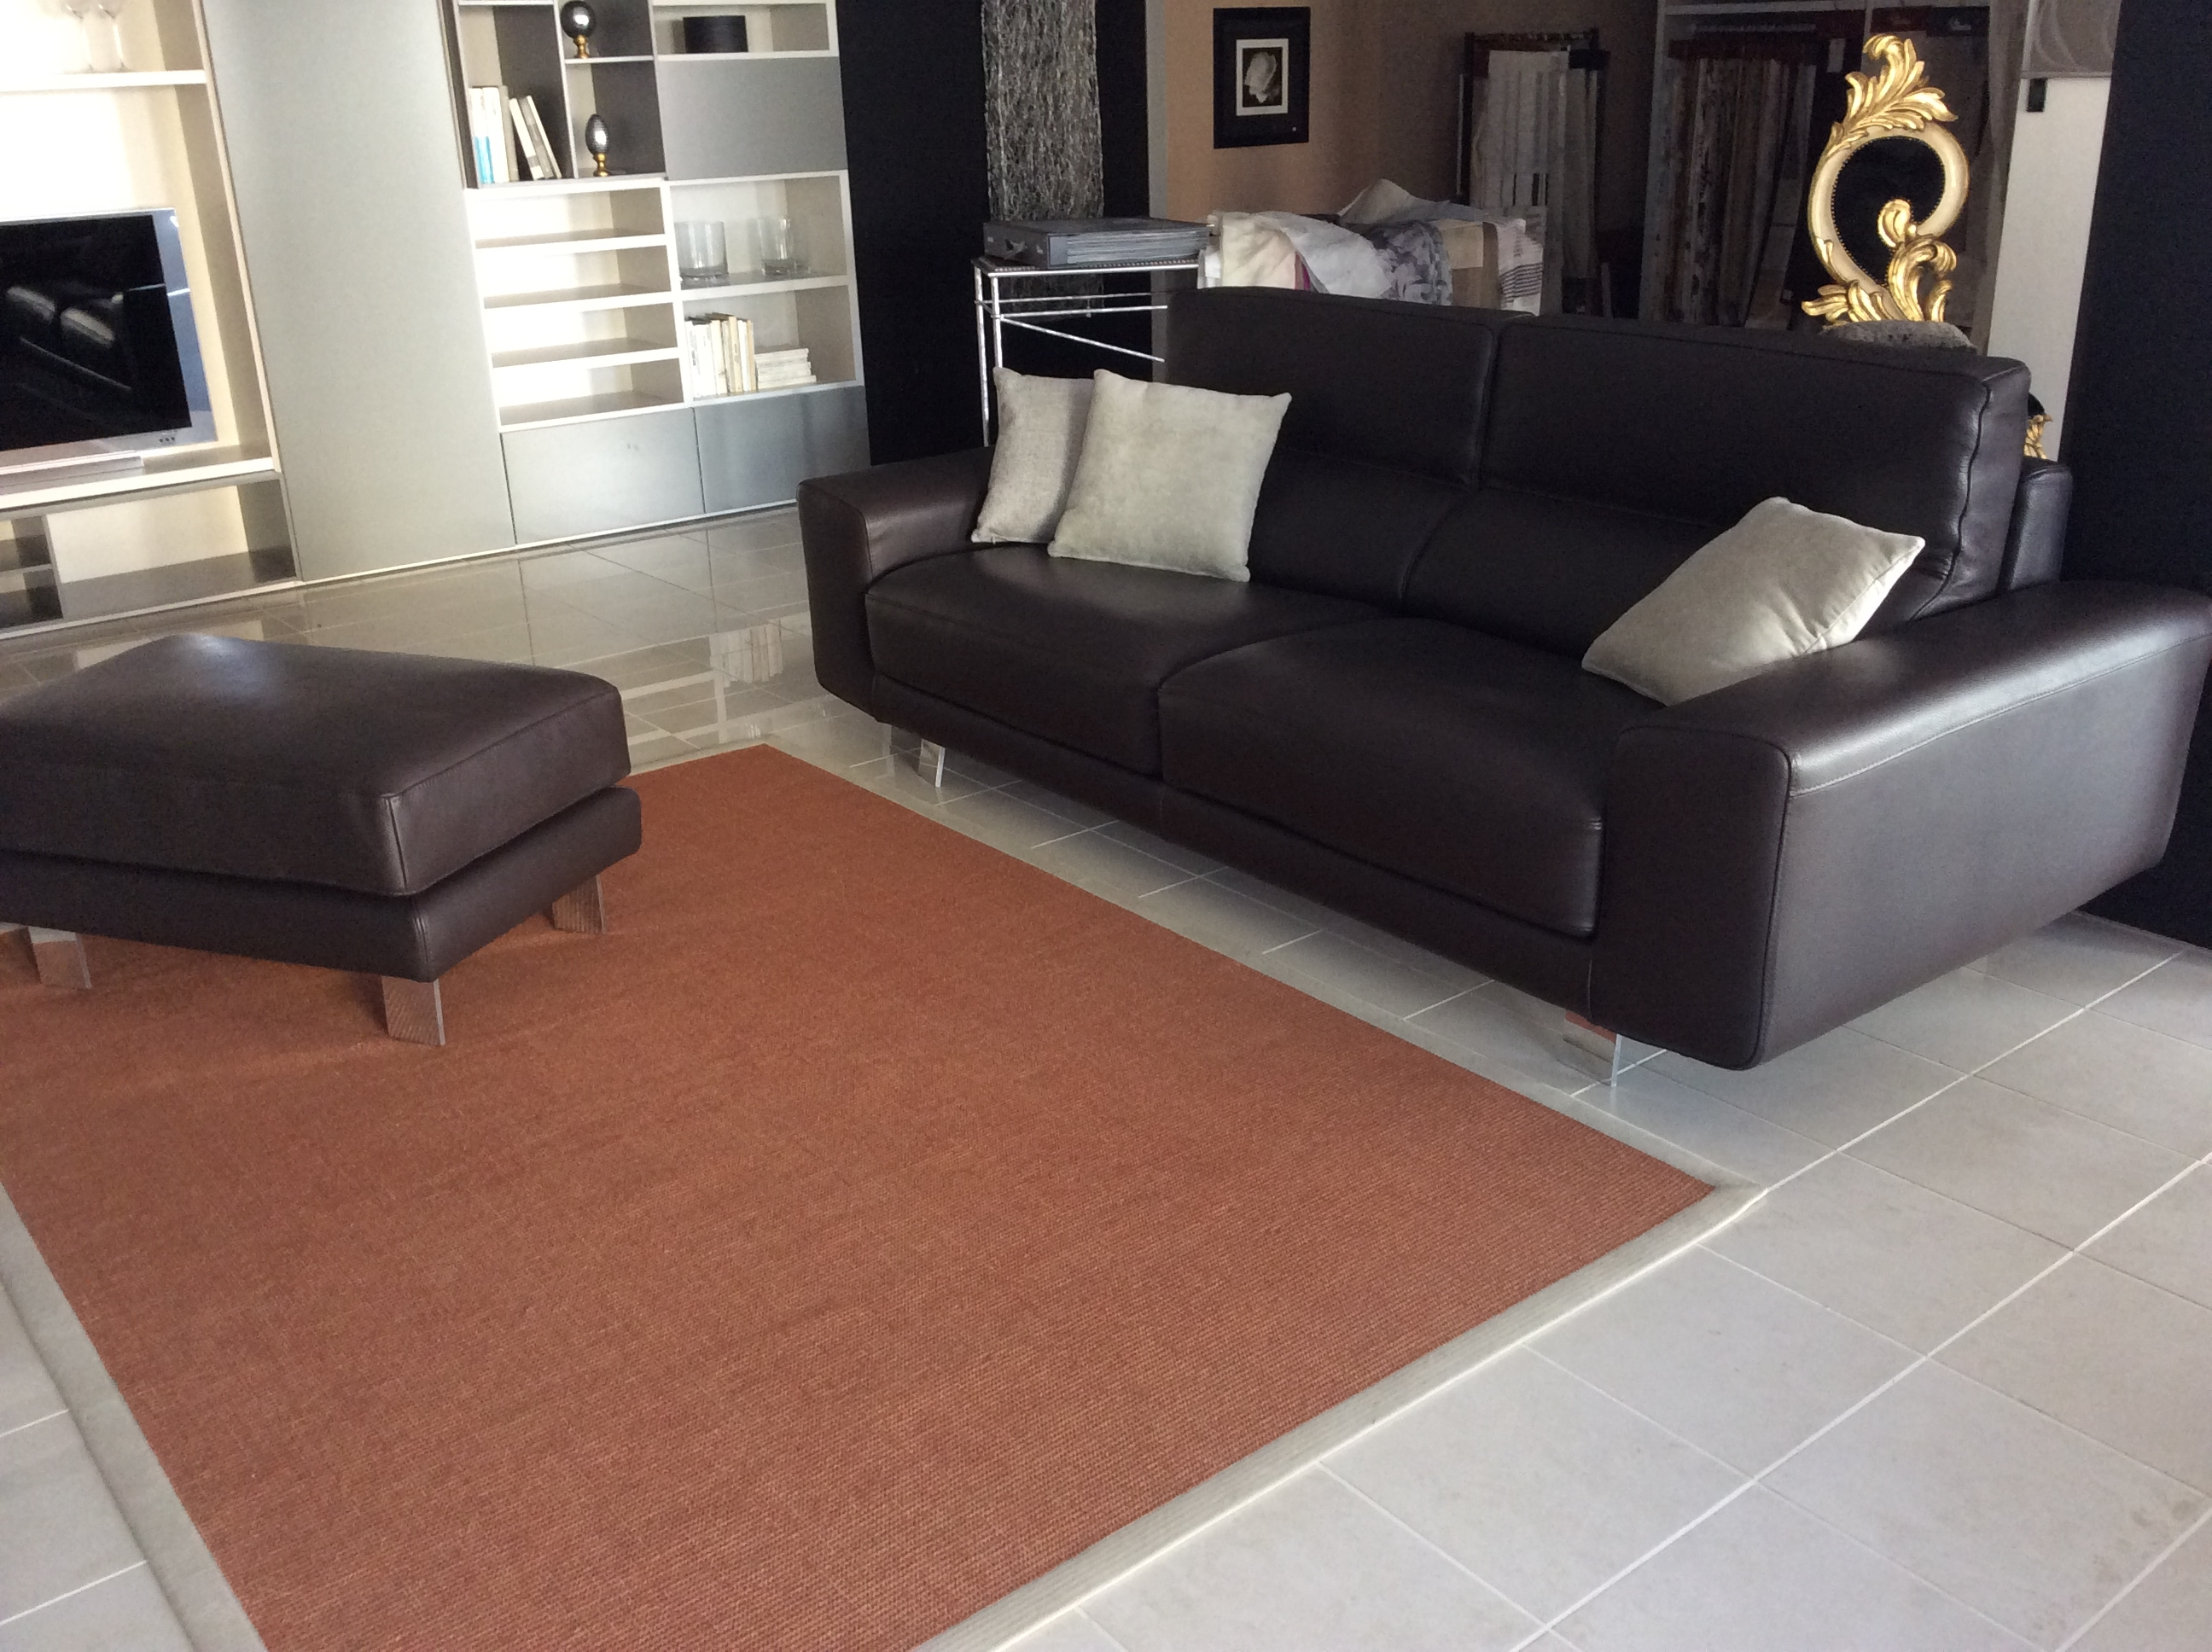 divani e divani klaus prezzo - 28 images - divano klaus ditre italia ...